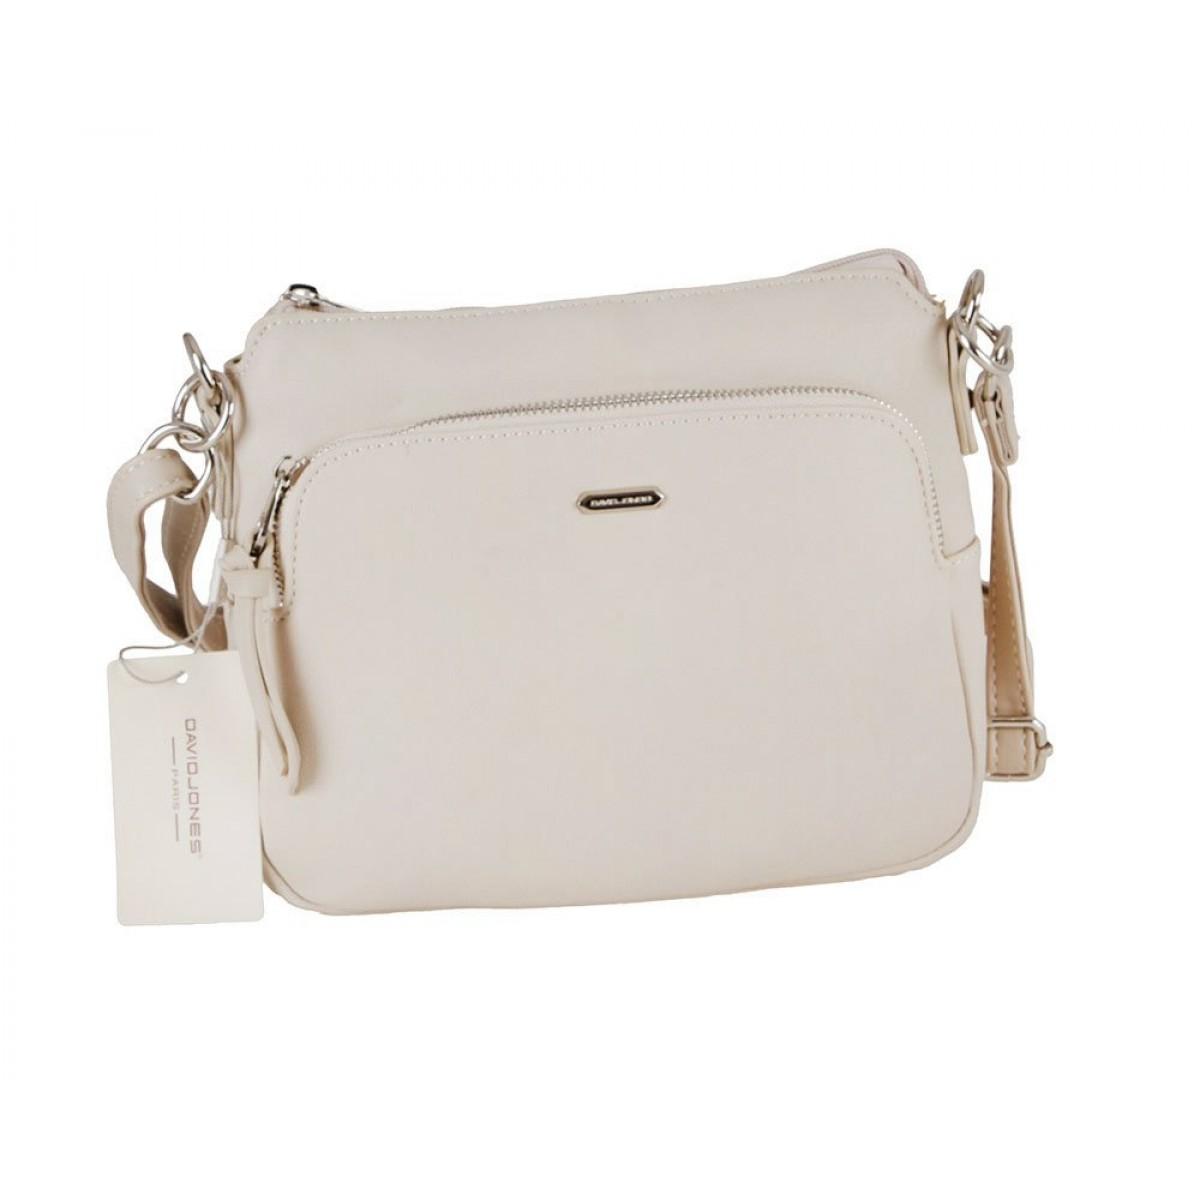 Жіноча сумка David Jones 6299-1 CREAMY WHITE